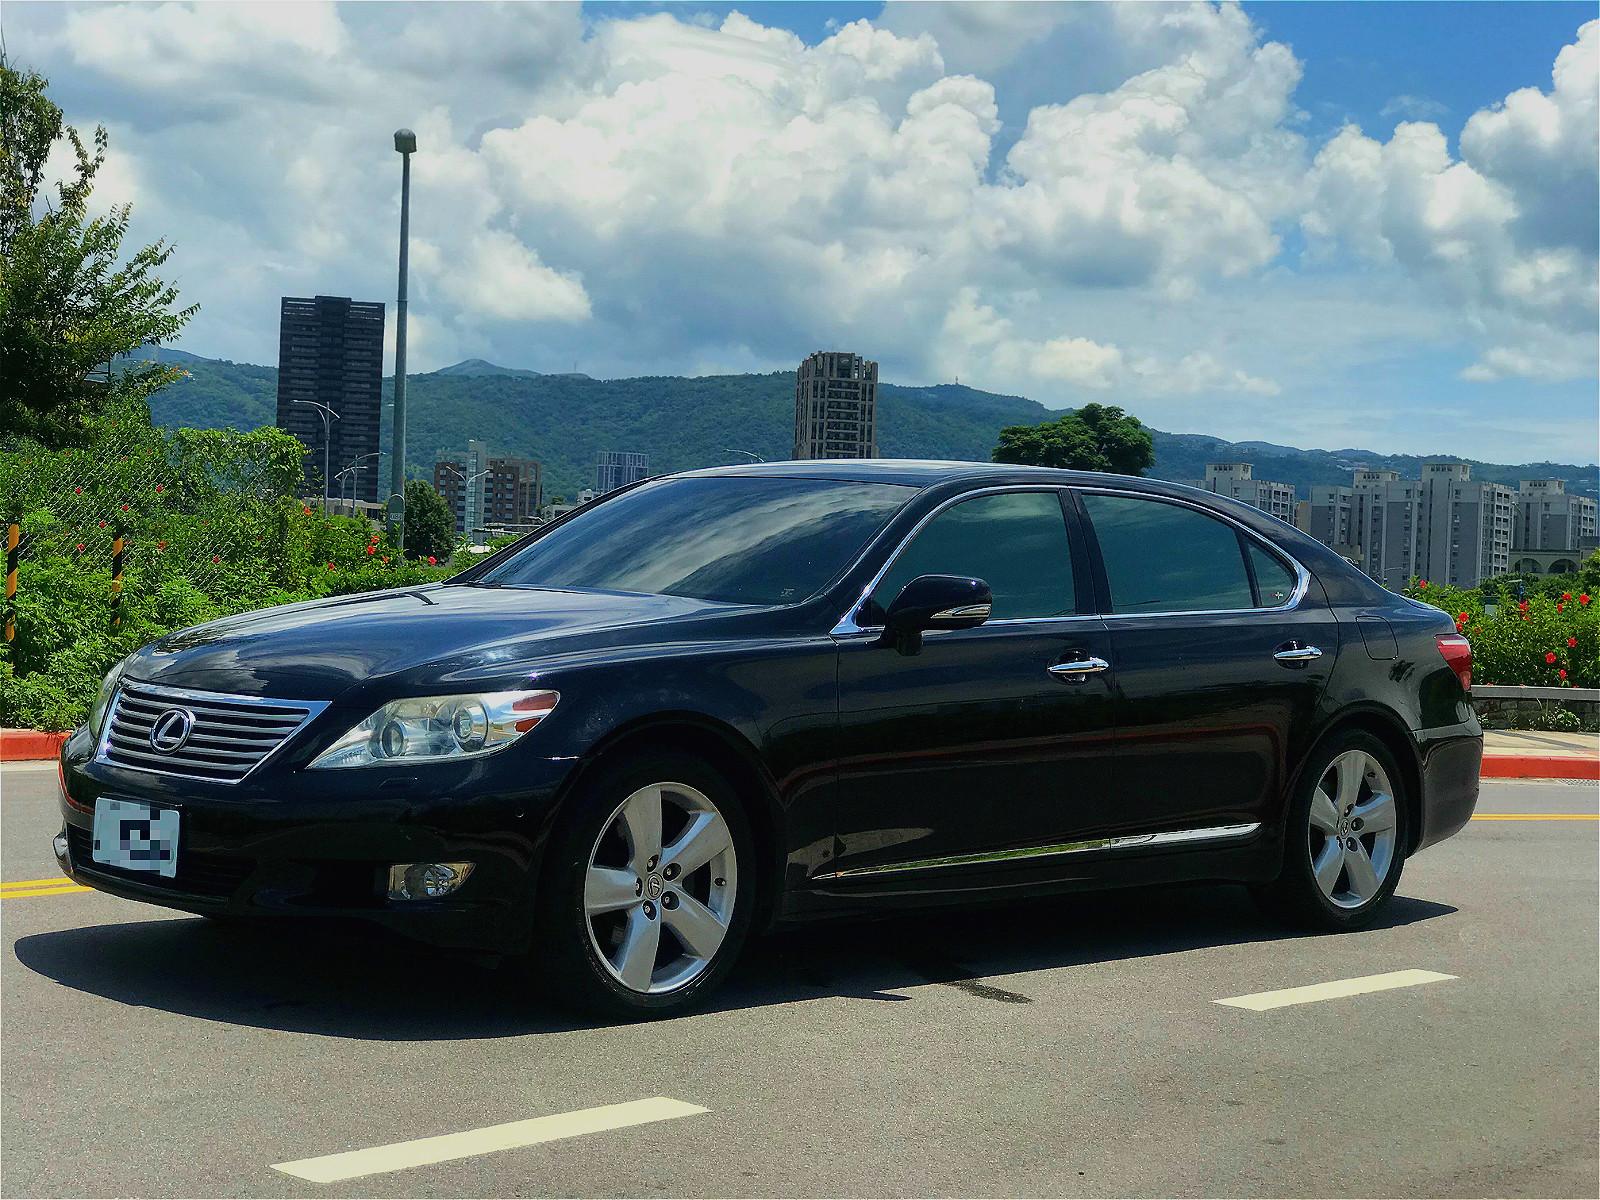 2010 Lexus 凌志 Ls